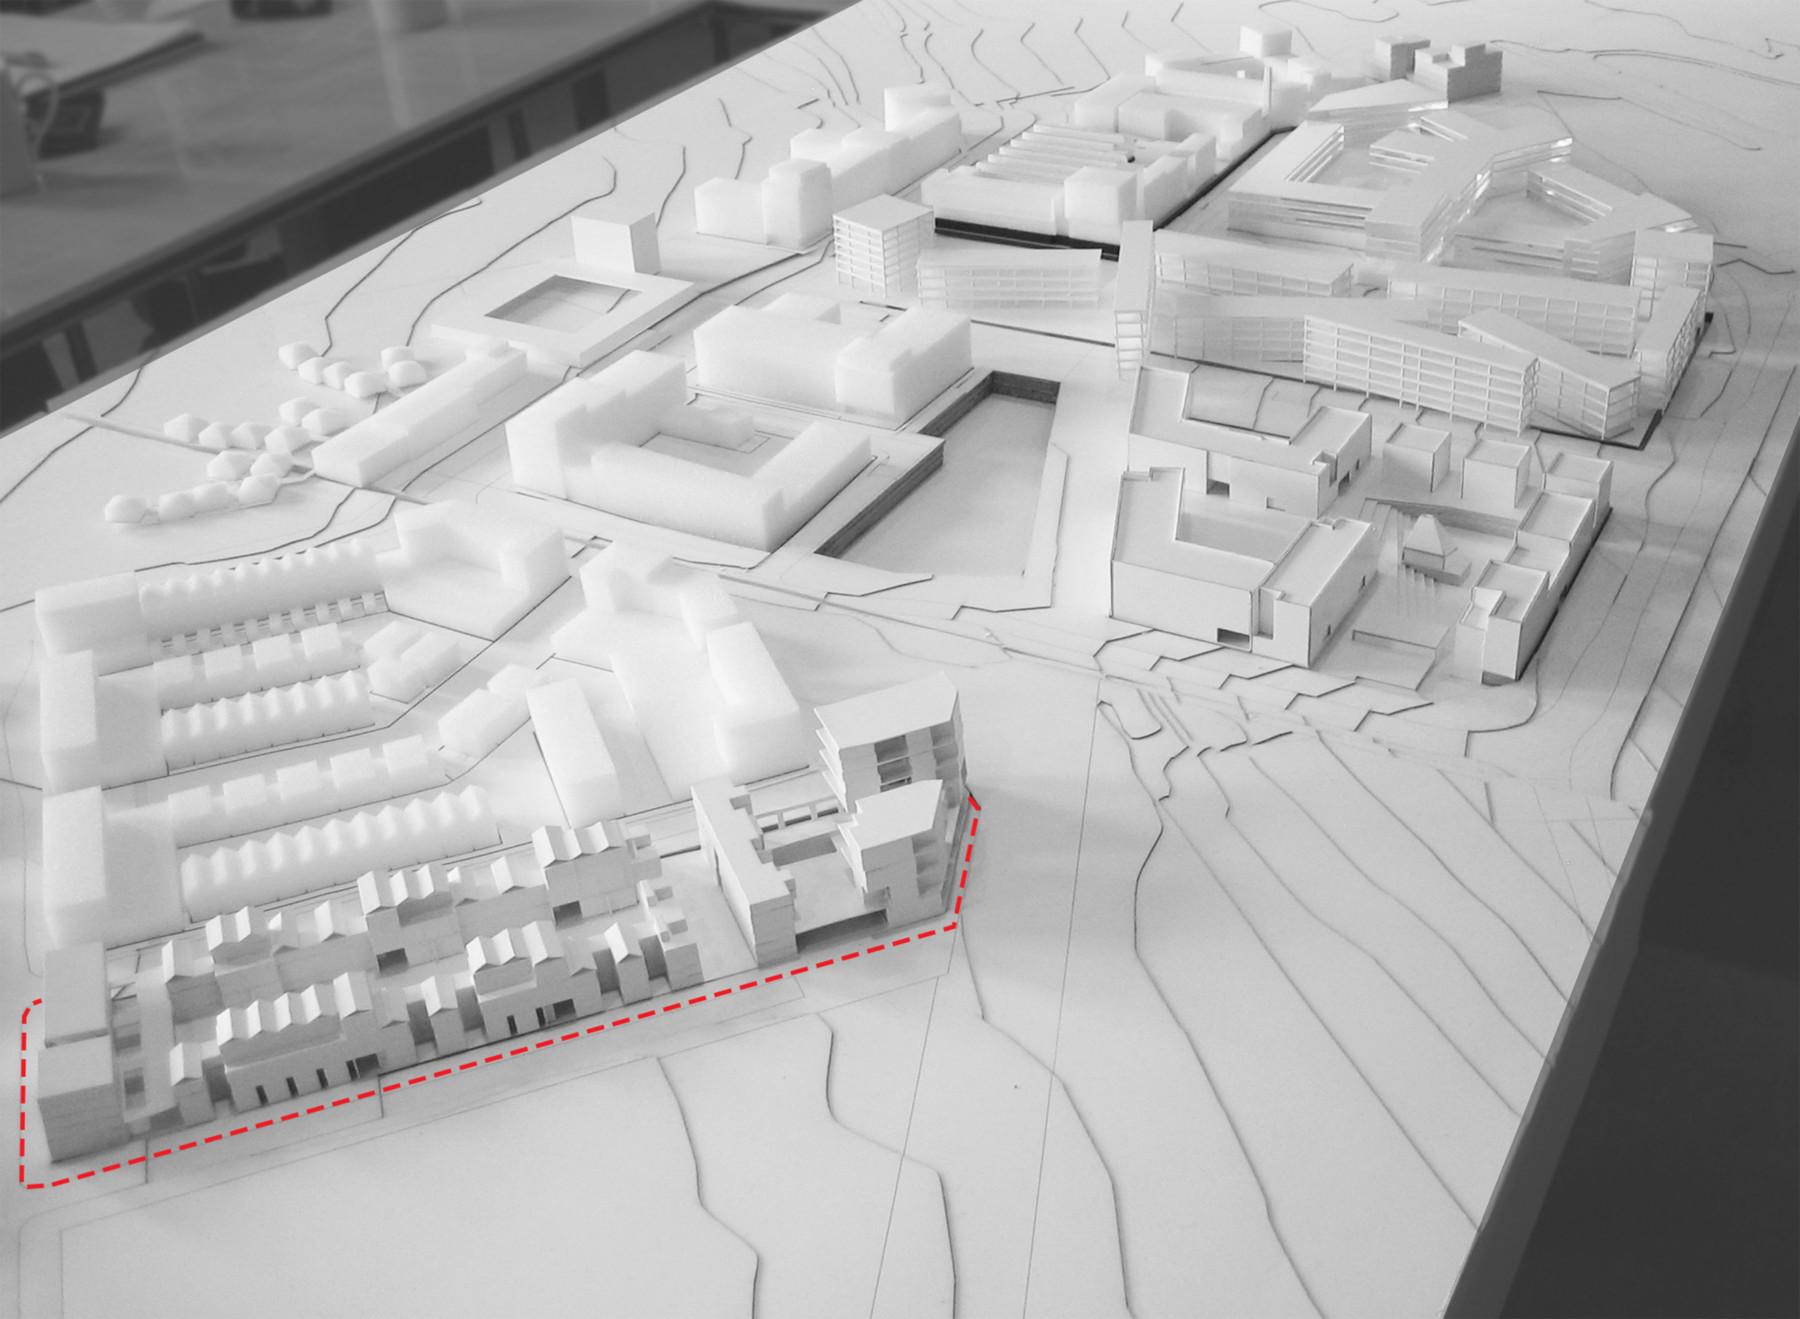 Sarah-Wigglesworth-Architects NWC lot4 3600